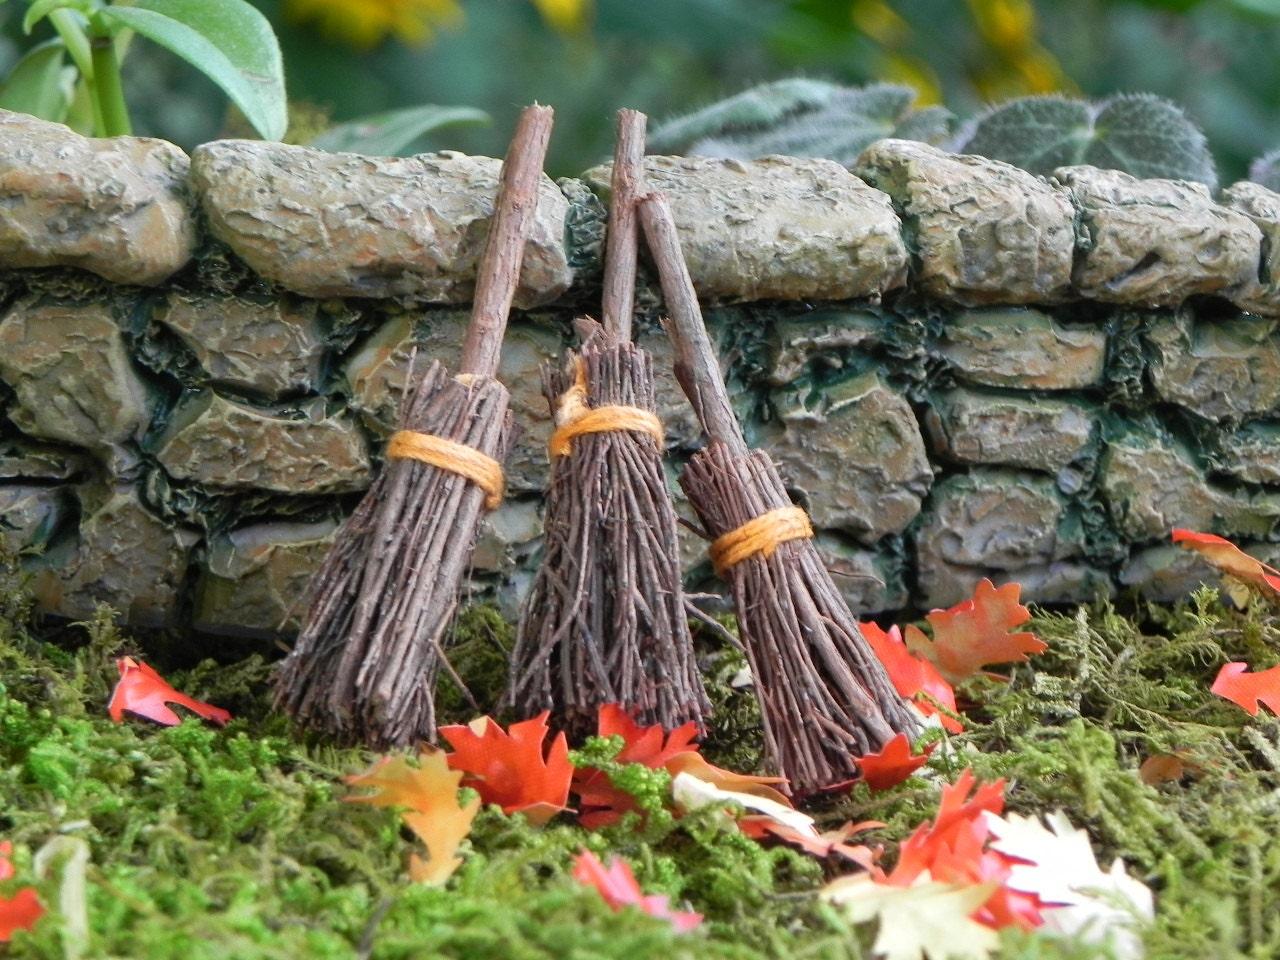 Broom miniature garden supply fairy garden accessories for How to make a fairy garden accessories